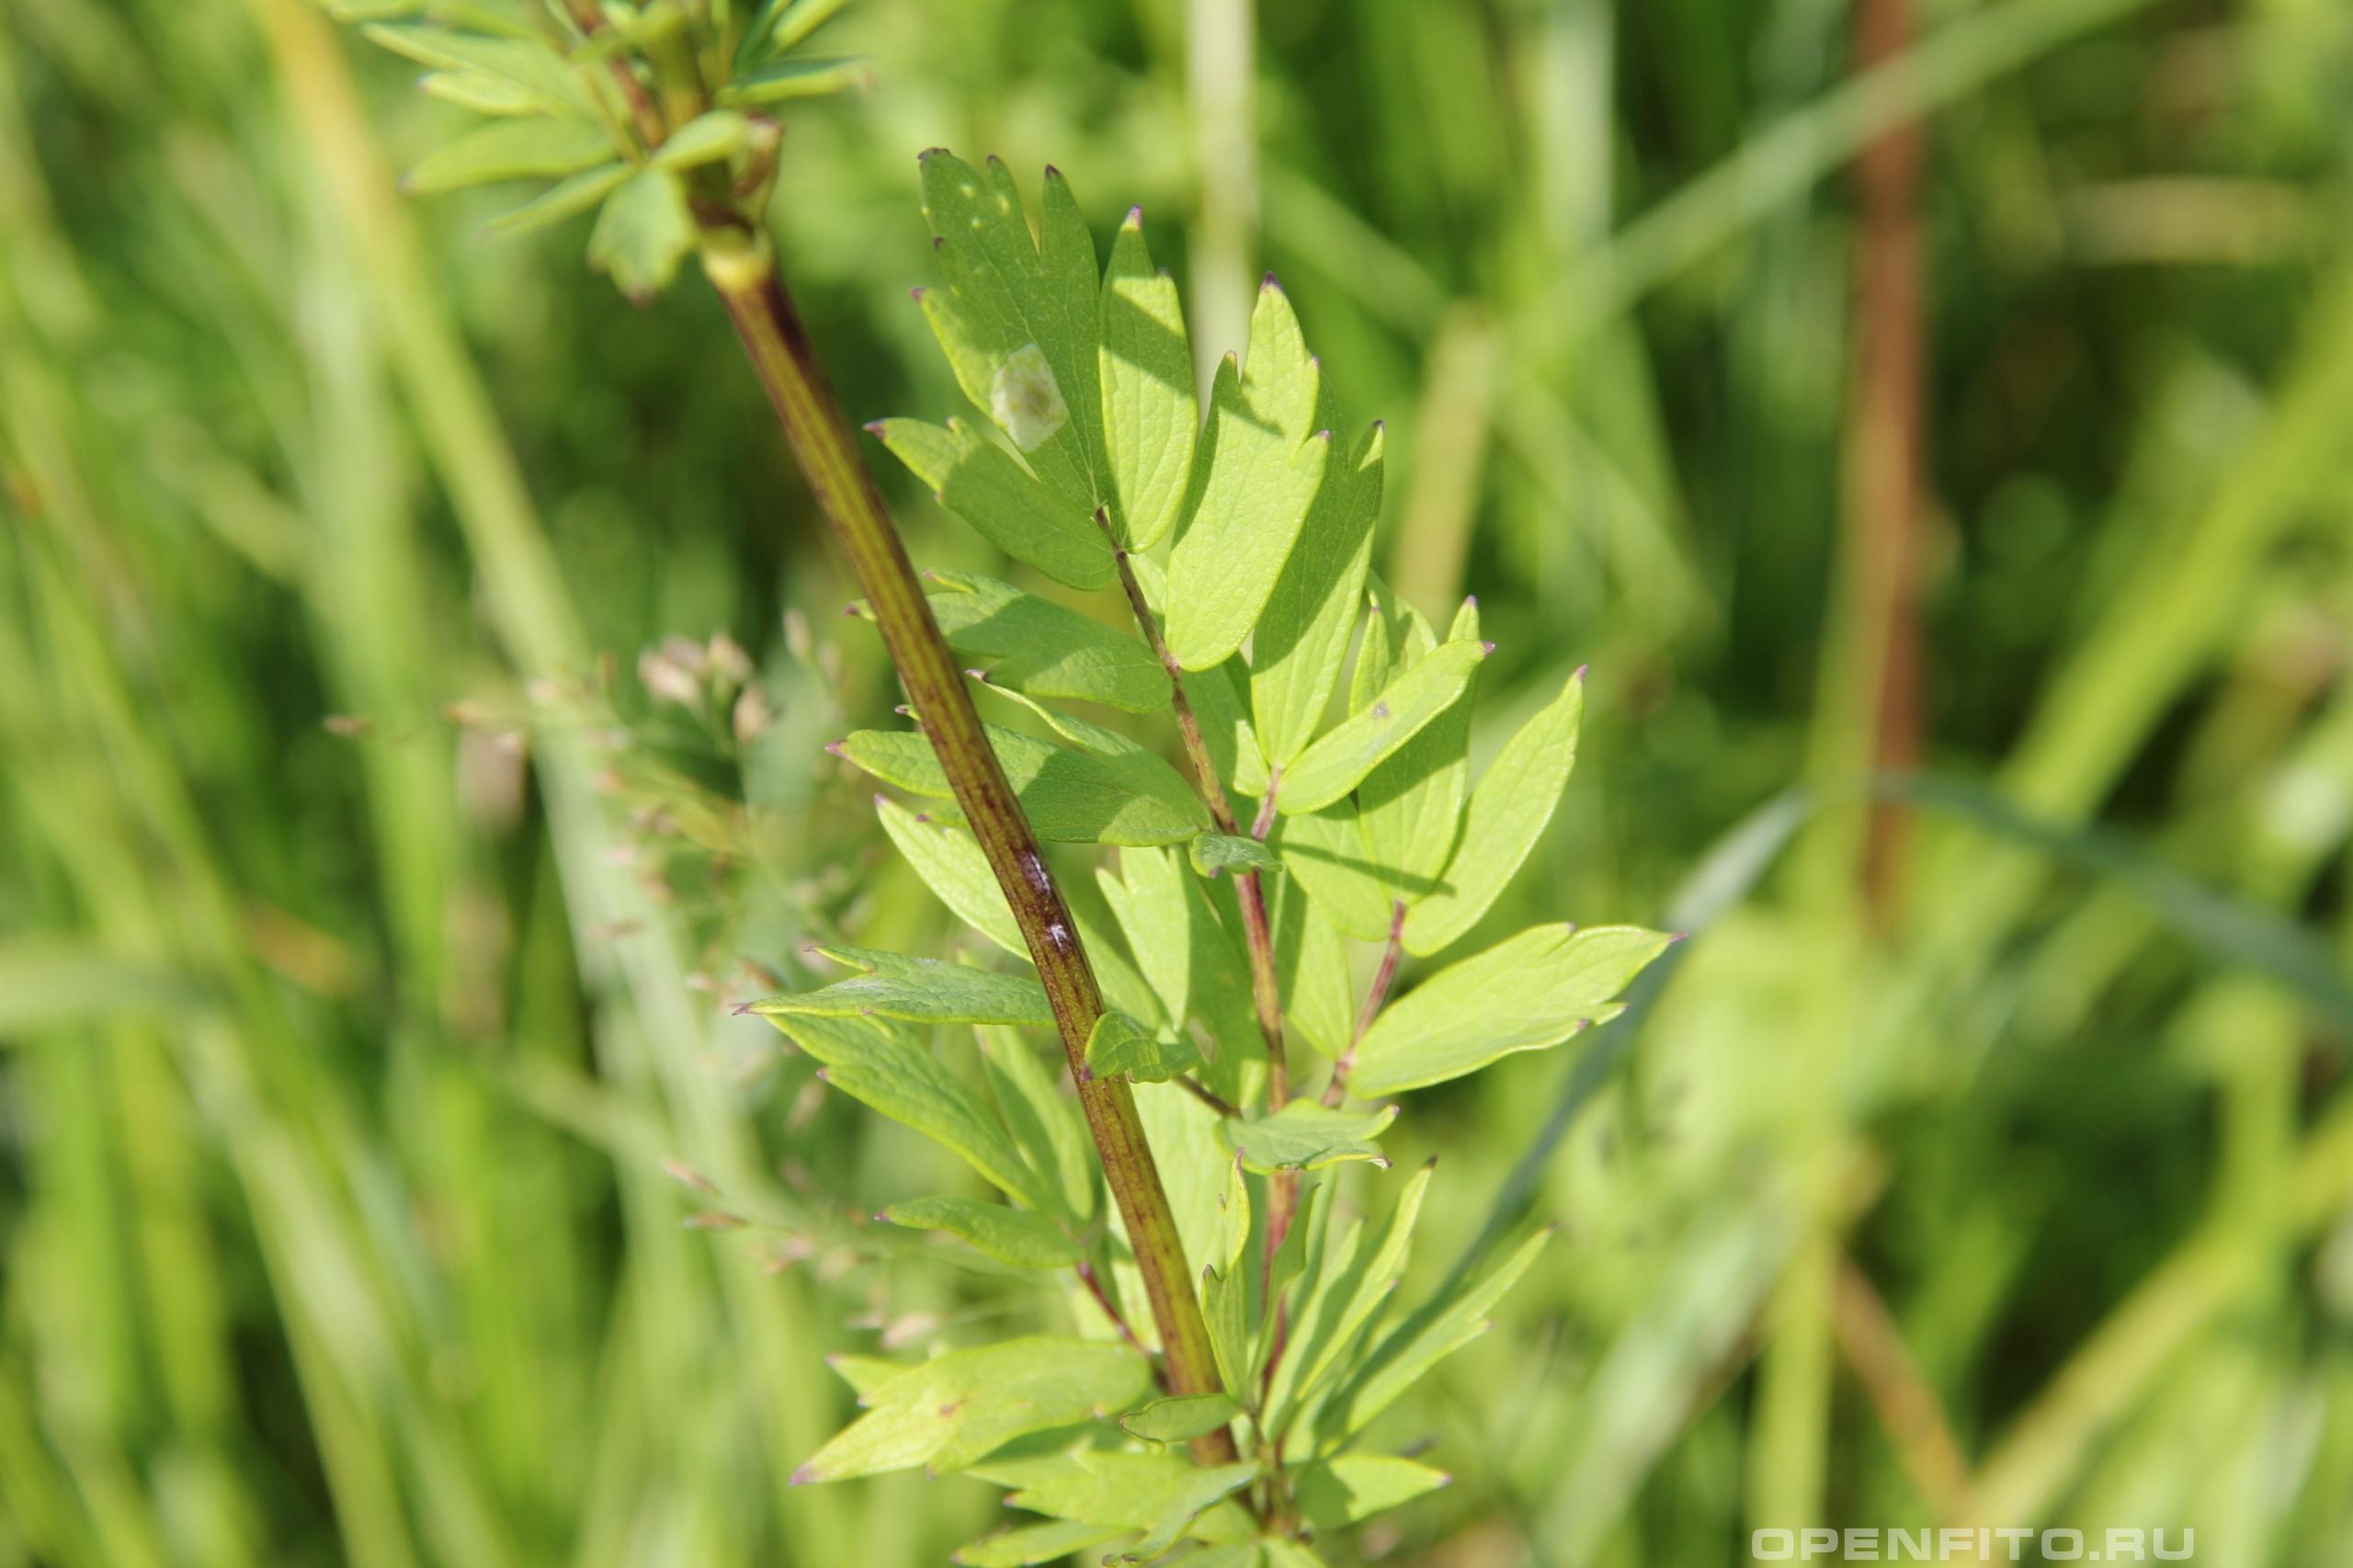 Василистник желтый <p>лист и стебель травы</p>